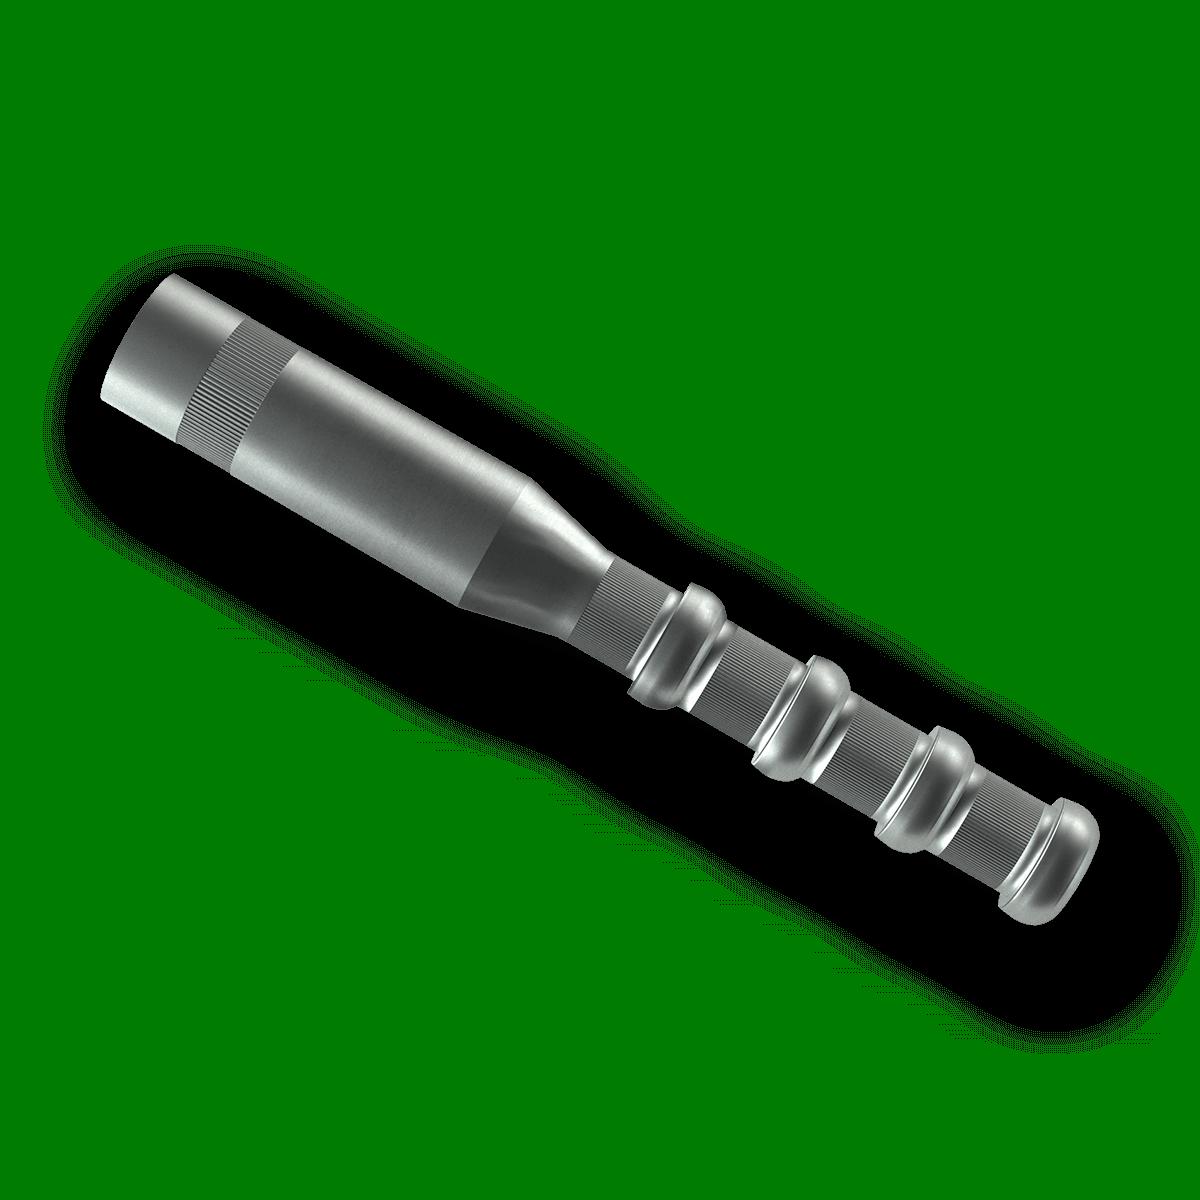 POWER-Sert™ Adhesive Insert Anchor — Type 304 Stainless Steel